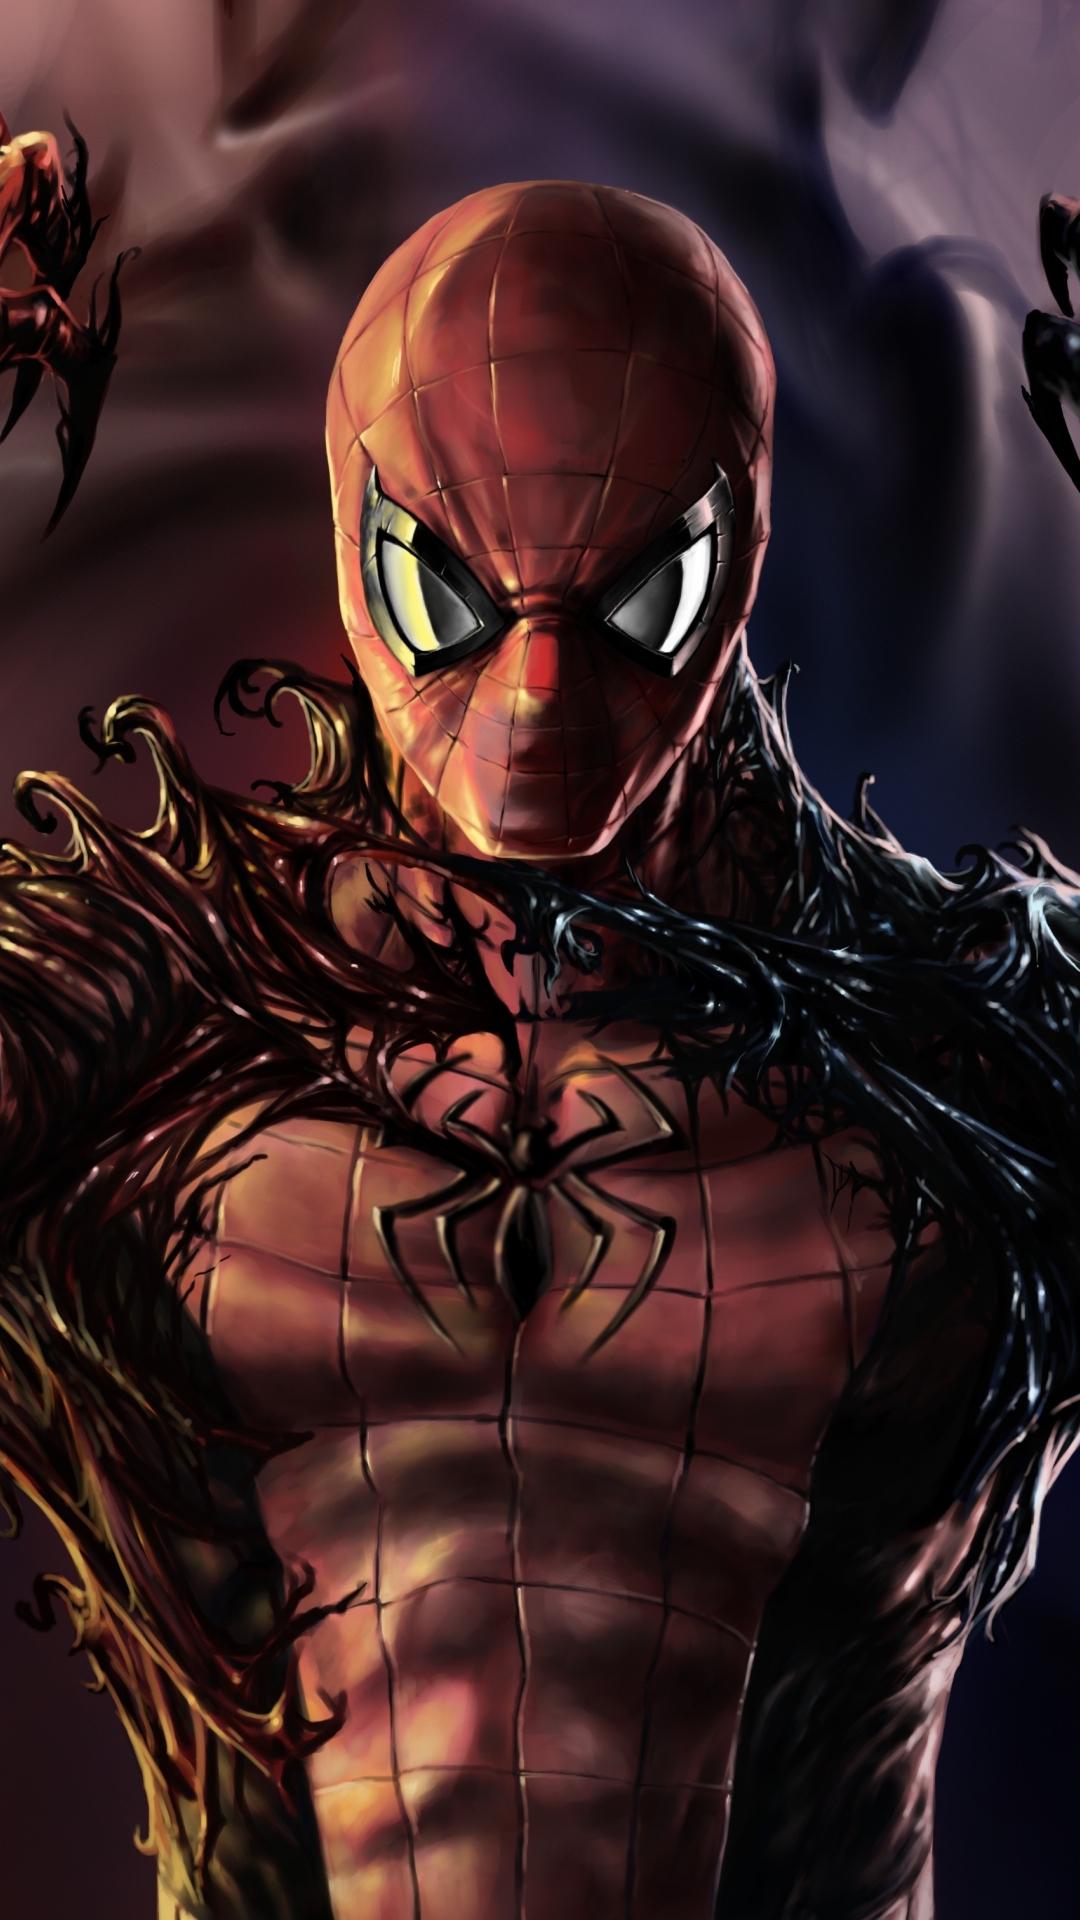 Download 1080x1920 Wallpaper Carnage Venom Spider Man Artwork